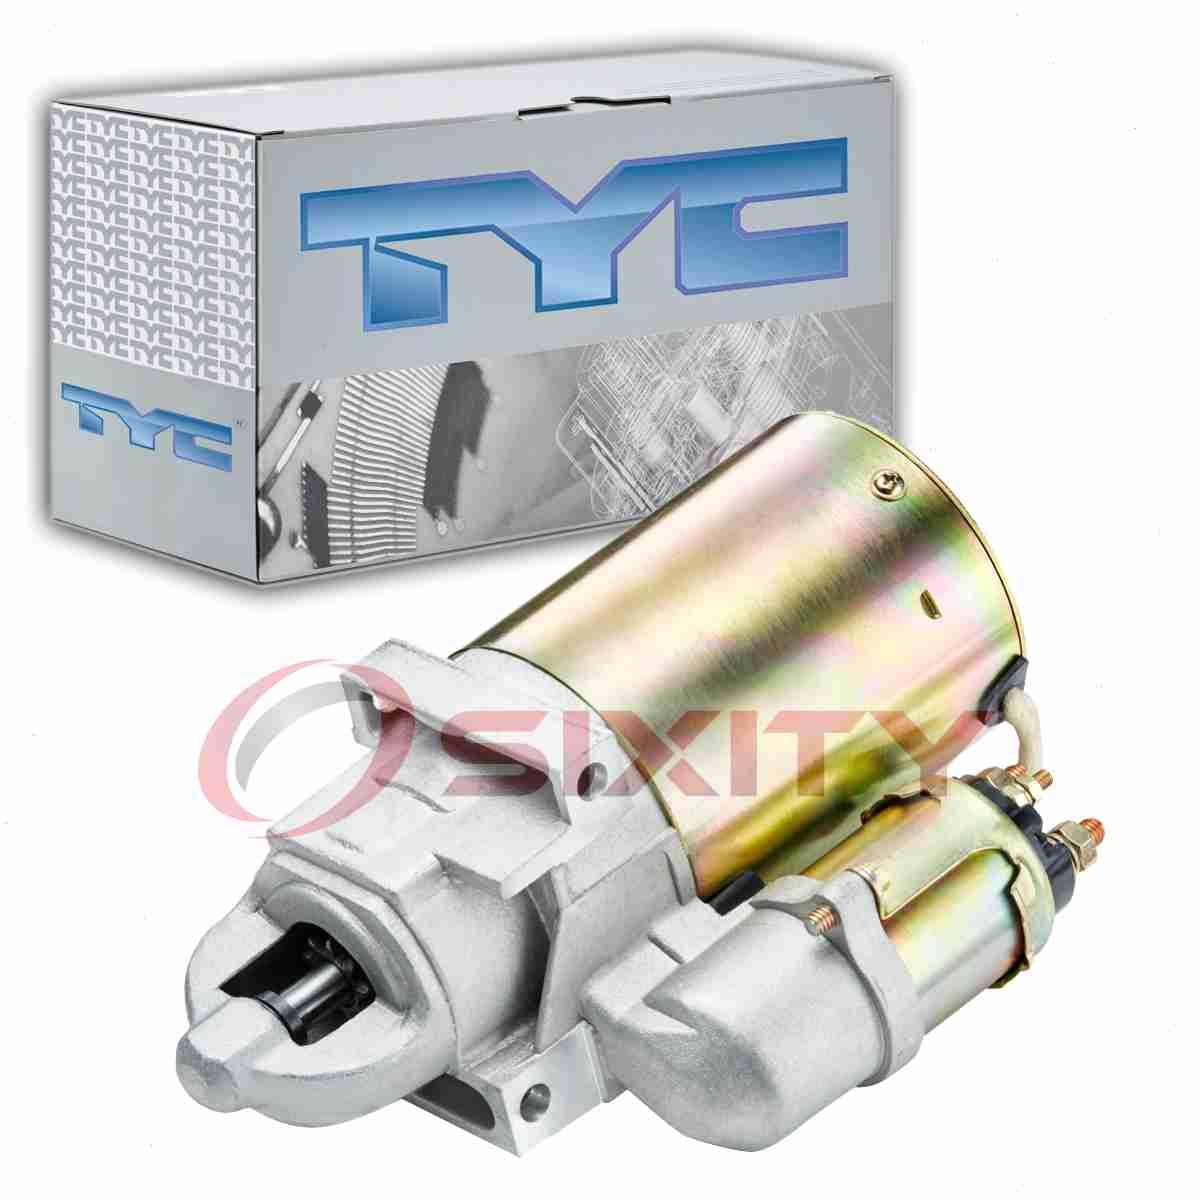 TYC Starter Motor for 1988-1996 Chevrolet C1500 4.3L V6 5.0L V8 xl